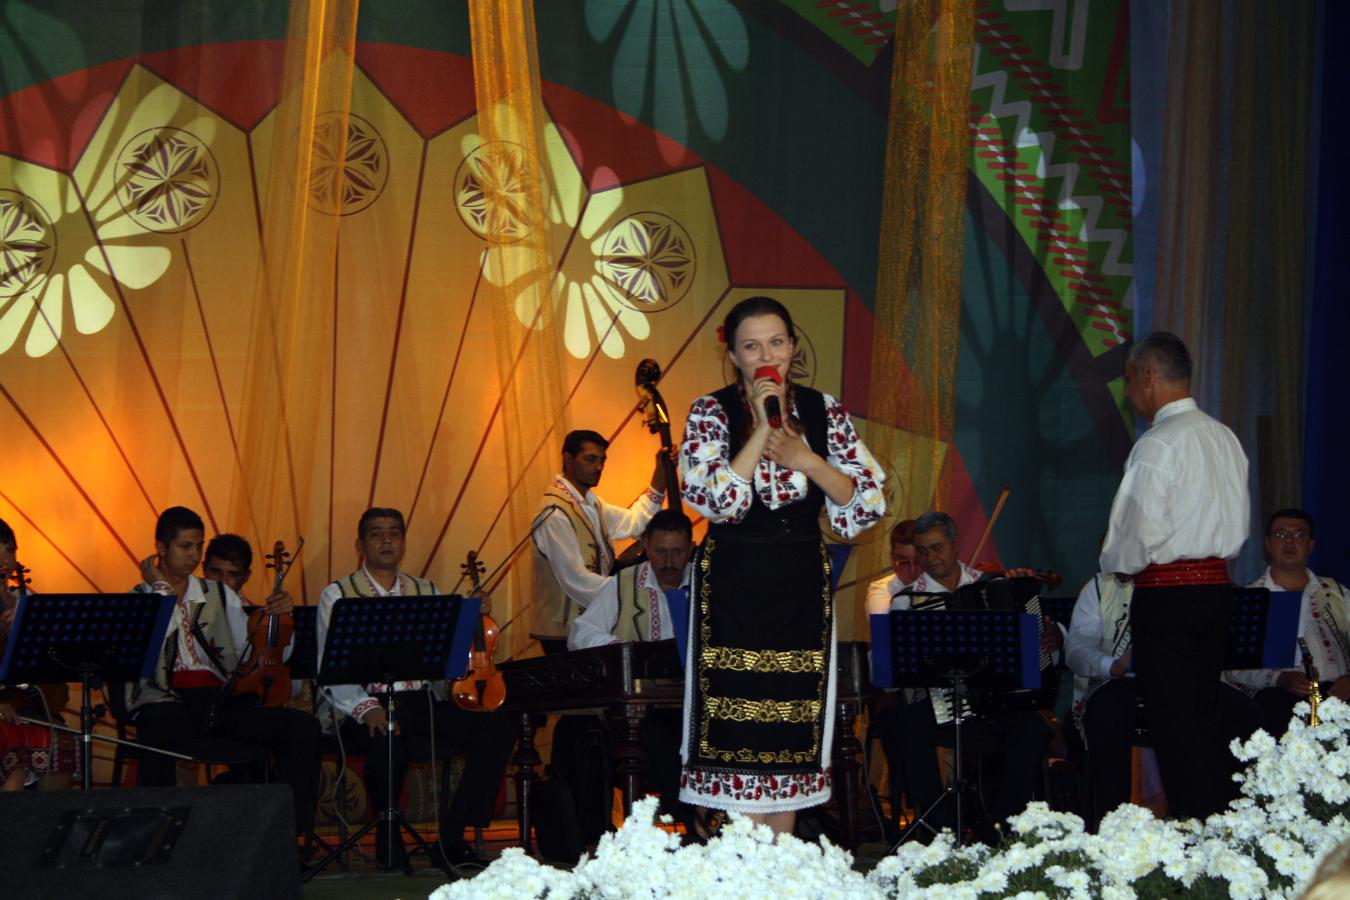 Premiul II - Ioana Dirstar - Covasna